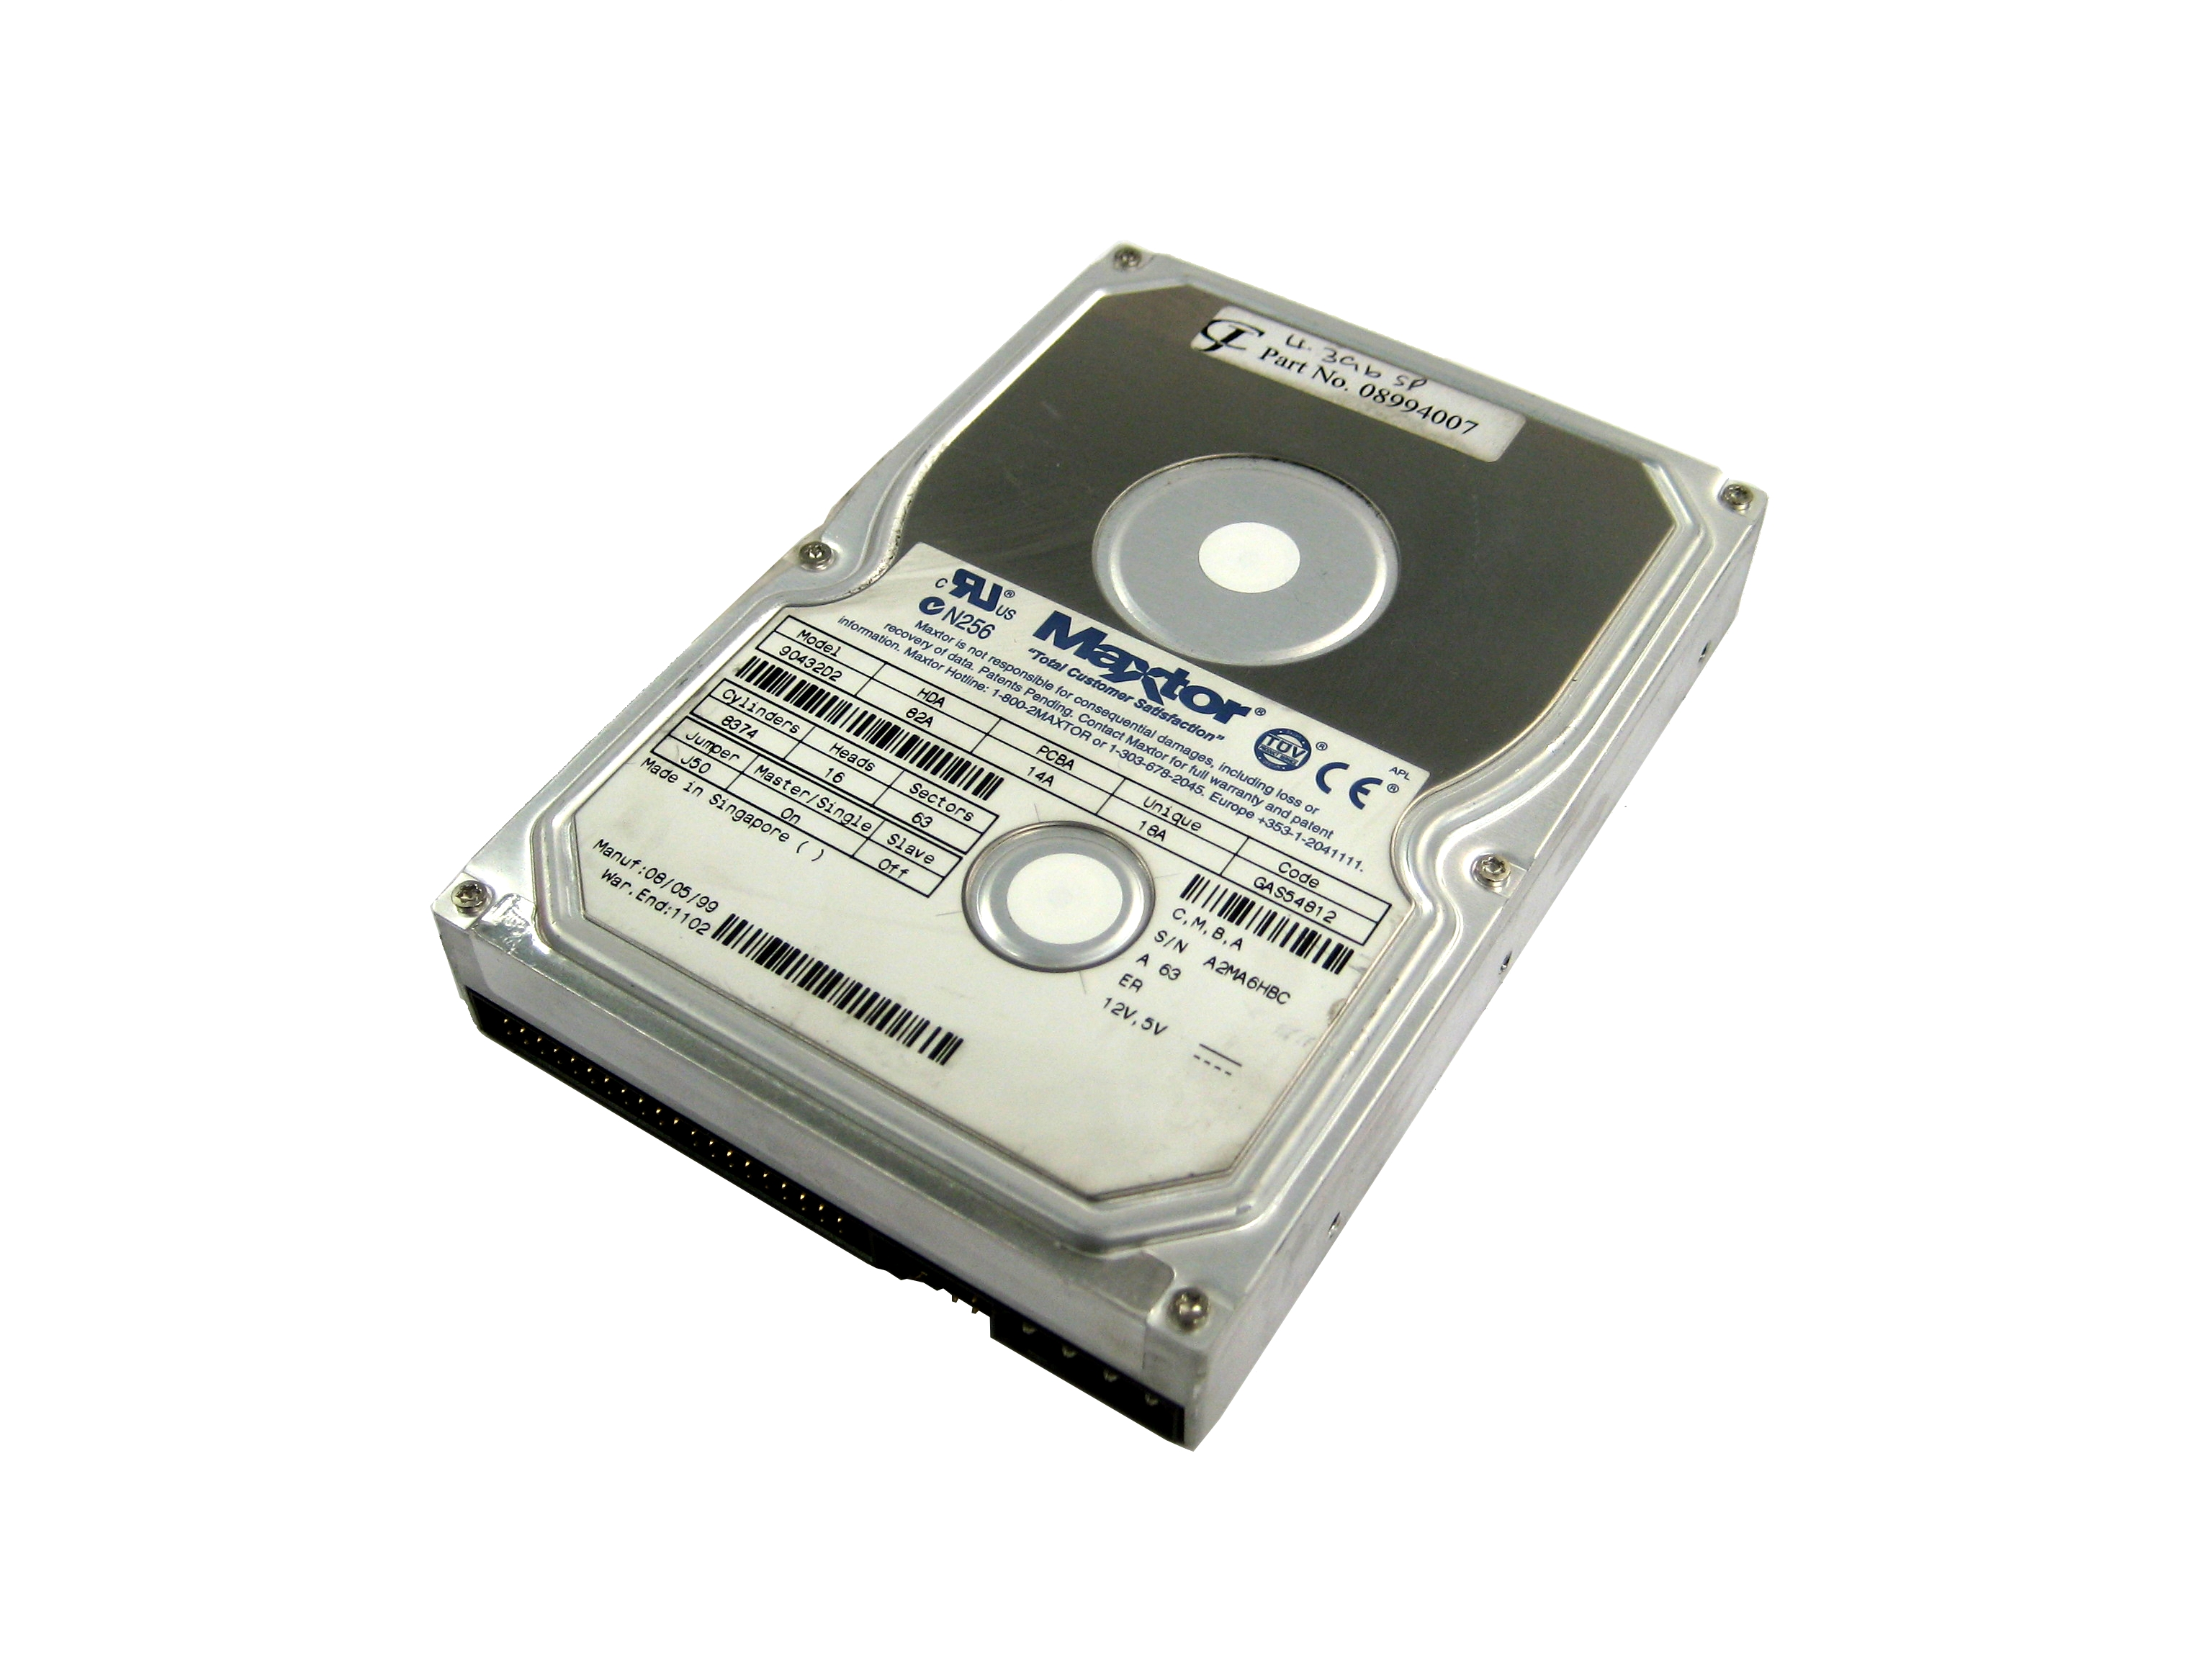 Hardisk Ata Maxtor 90432d2 4gb 5400rpm Ultra 33 40 Pin Disk Drive 102645887845 Ebay